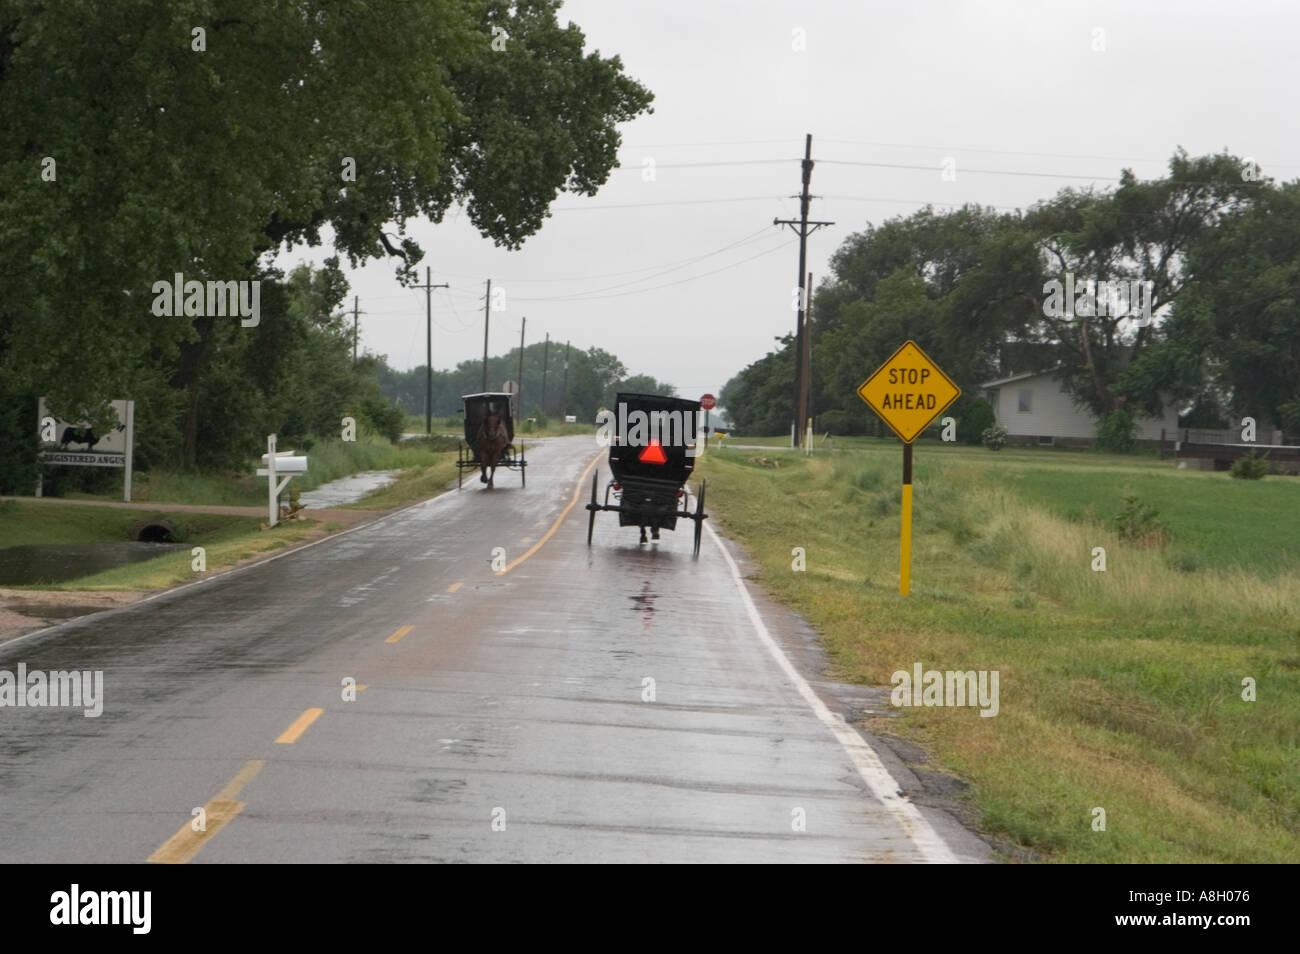 Amish Carriages on Rain Slicked Road Yoder Kansas Stock Photo